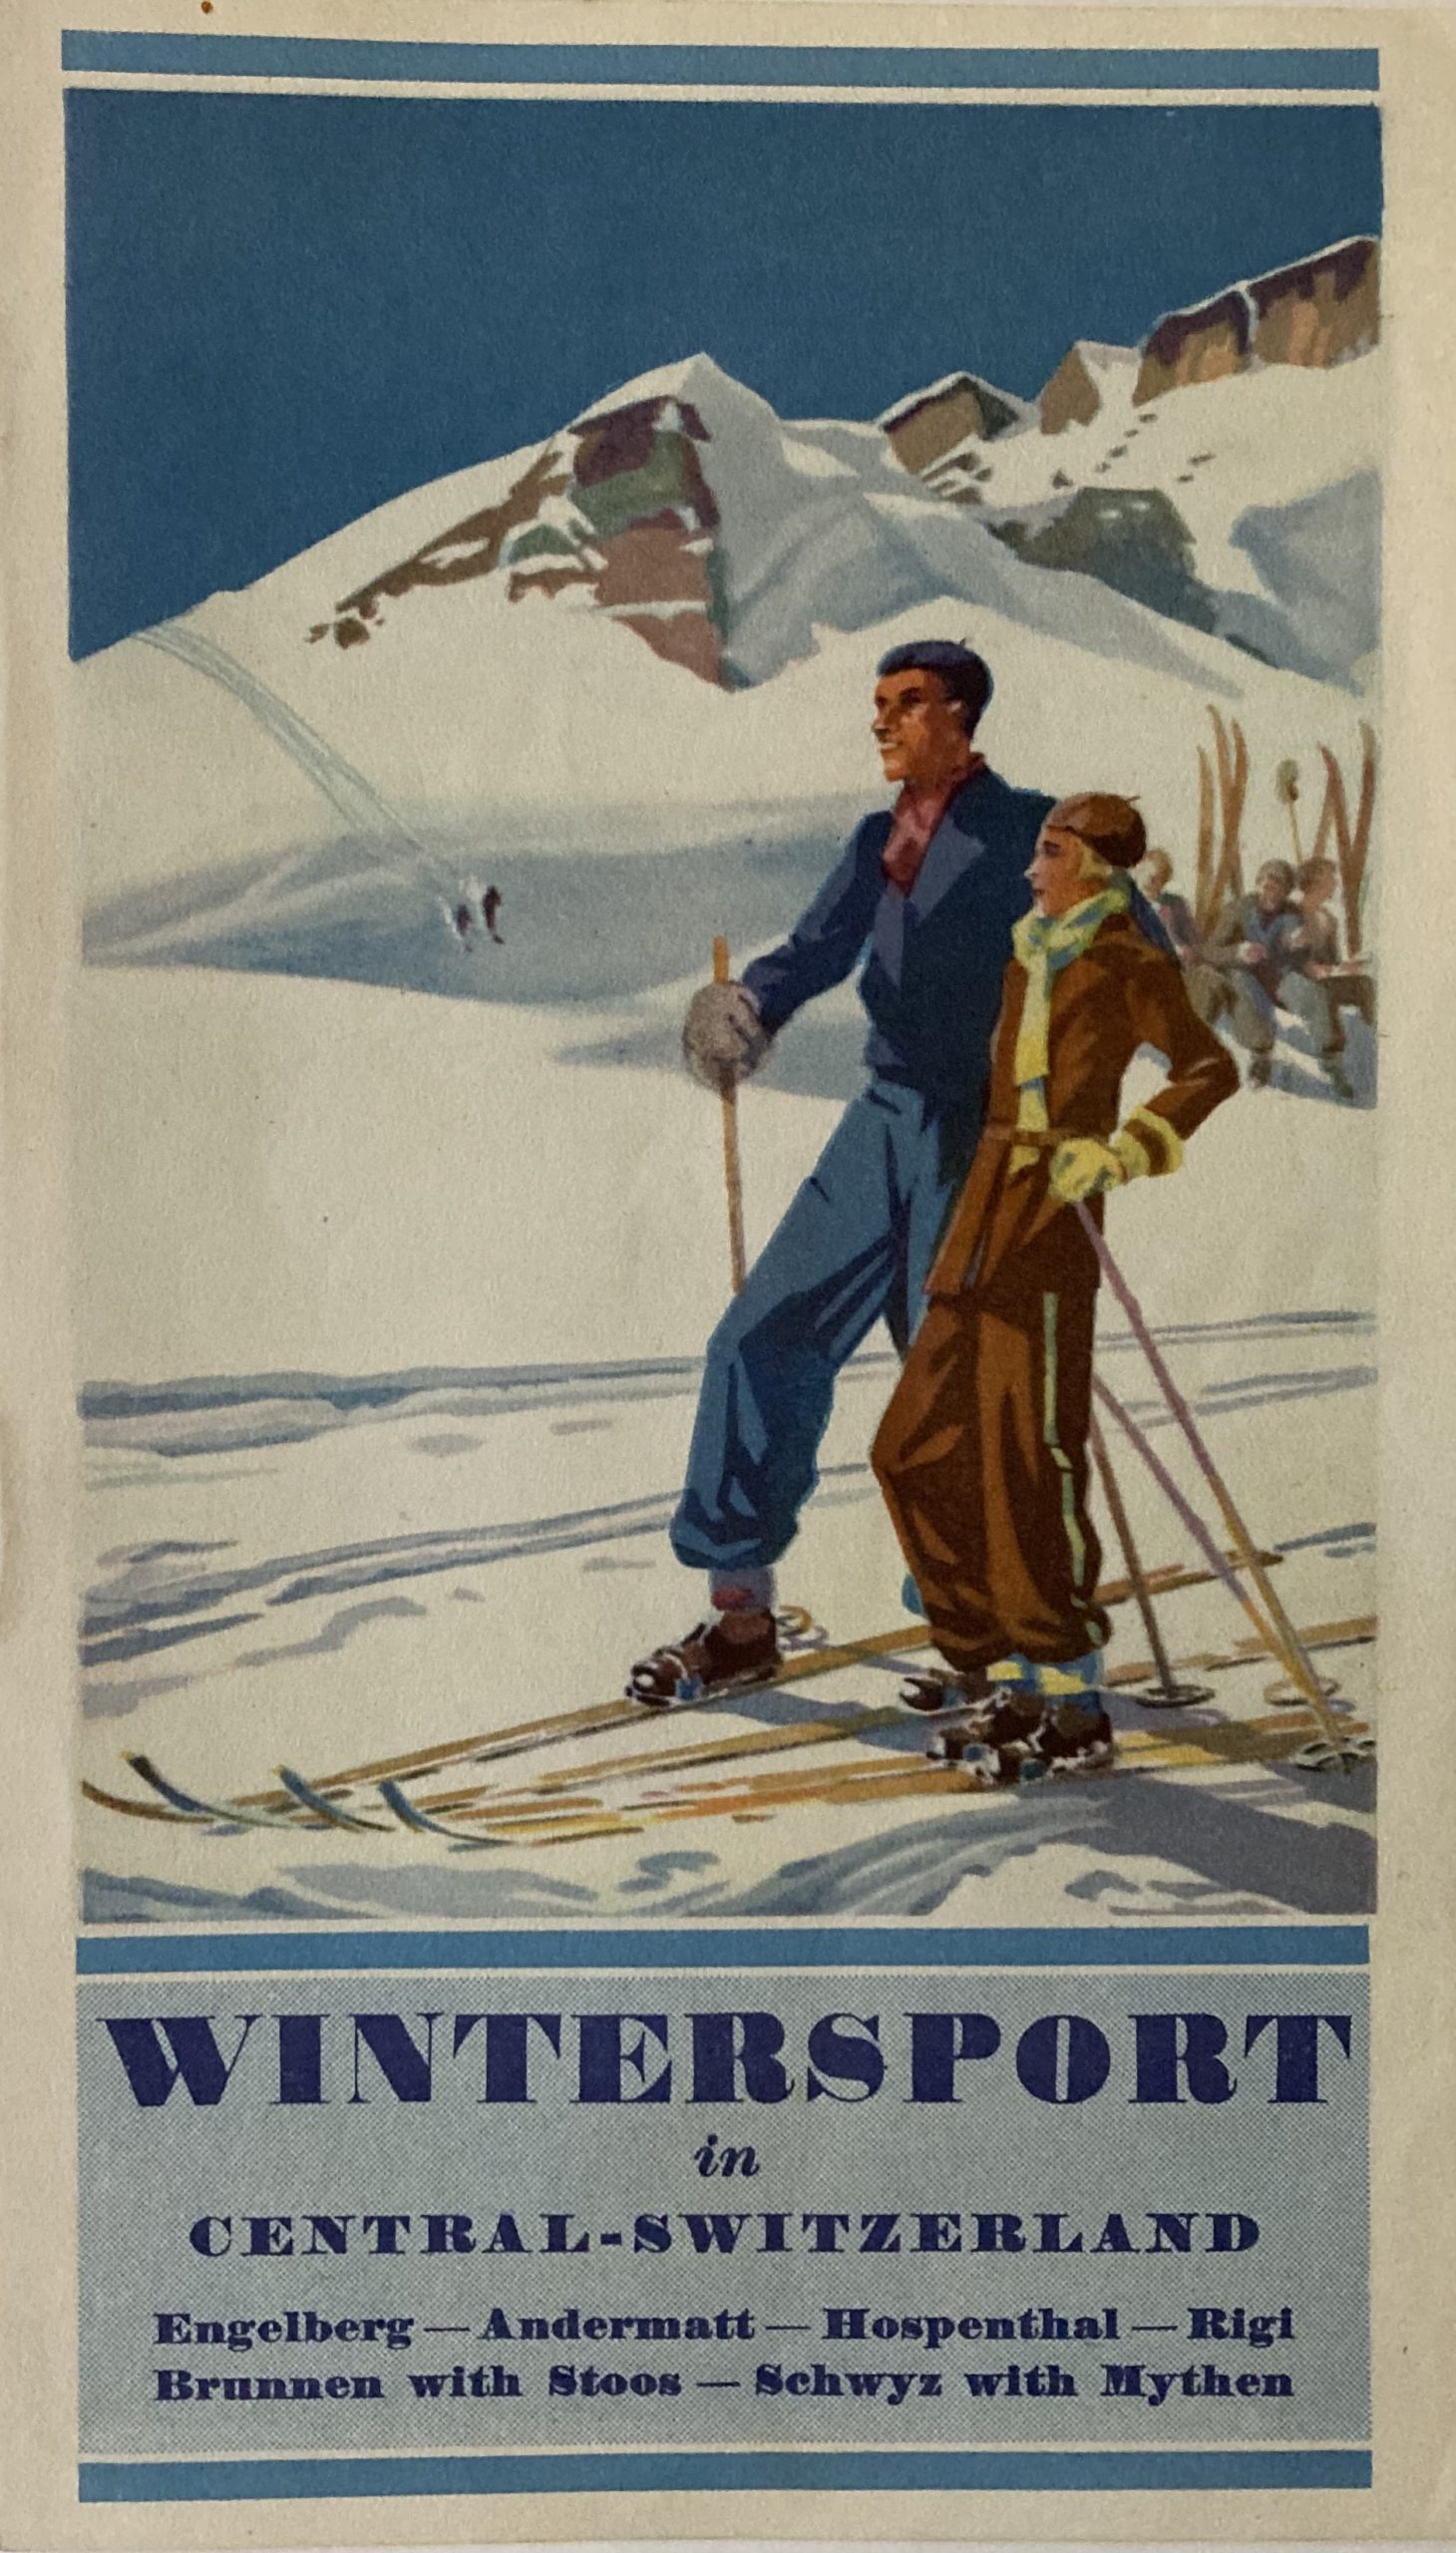 Brochure for Wintersport skiing